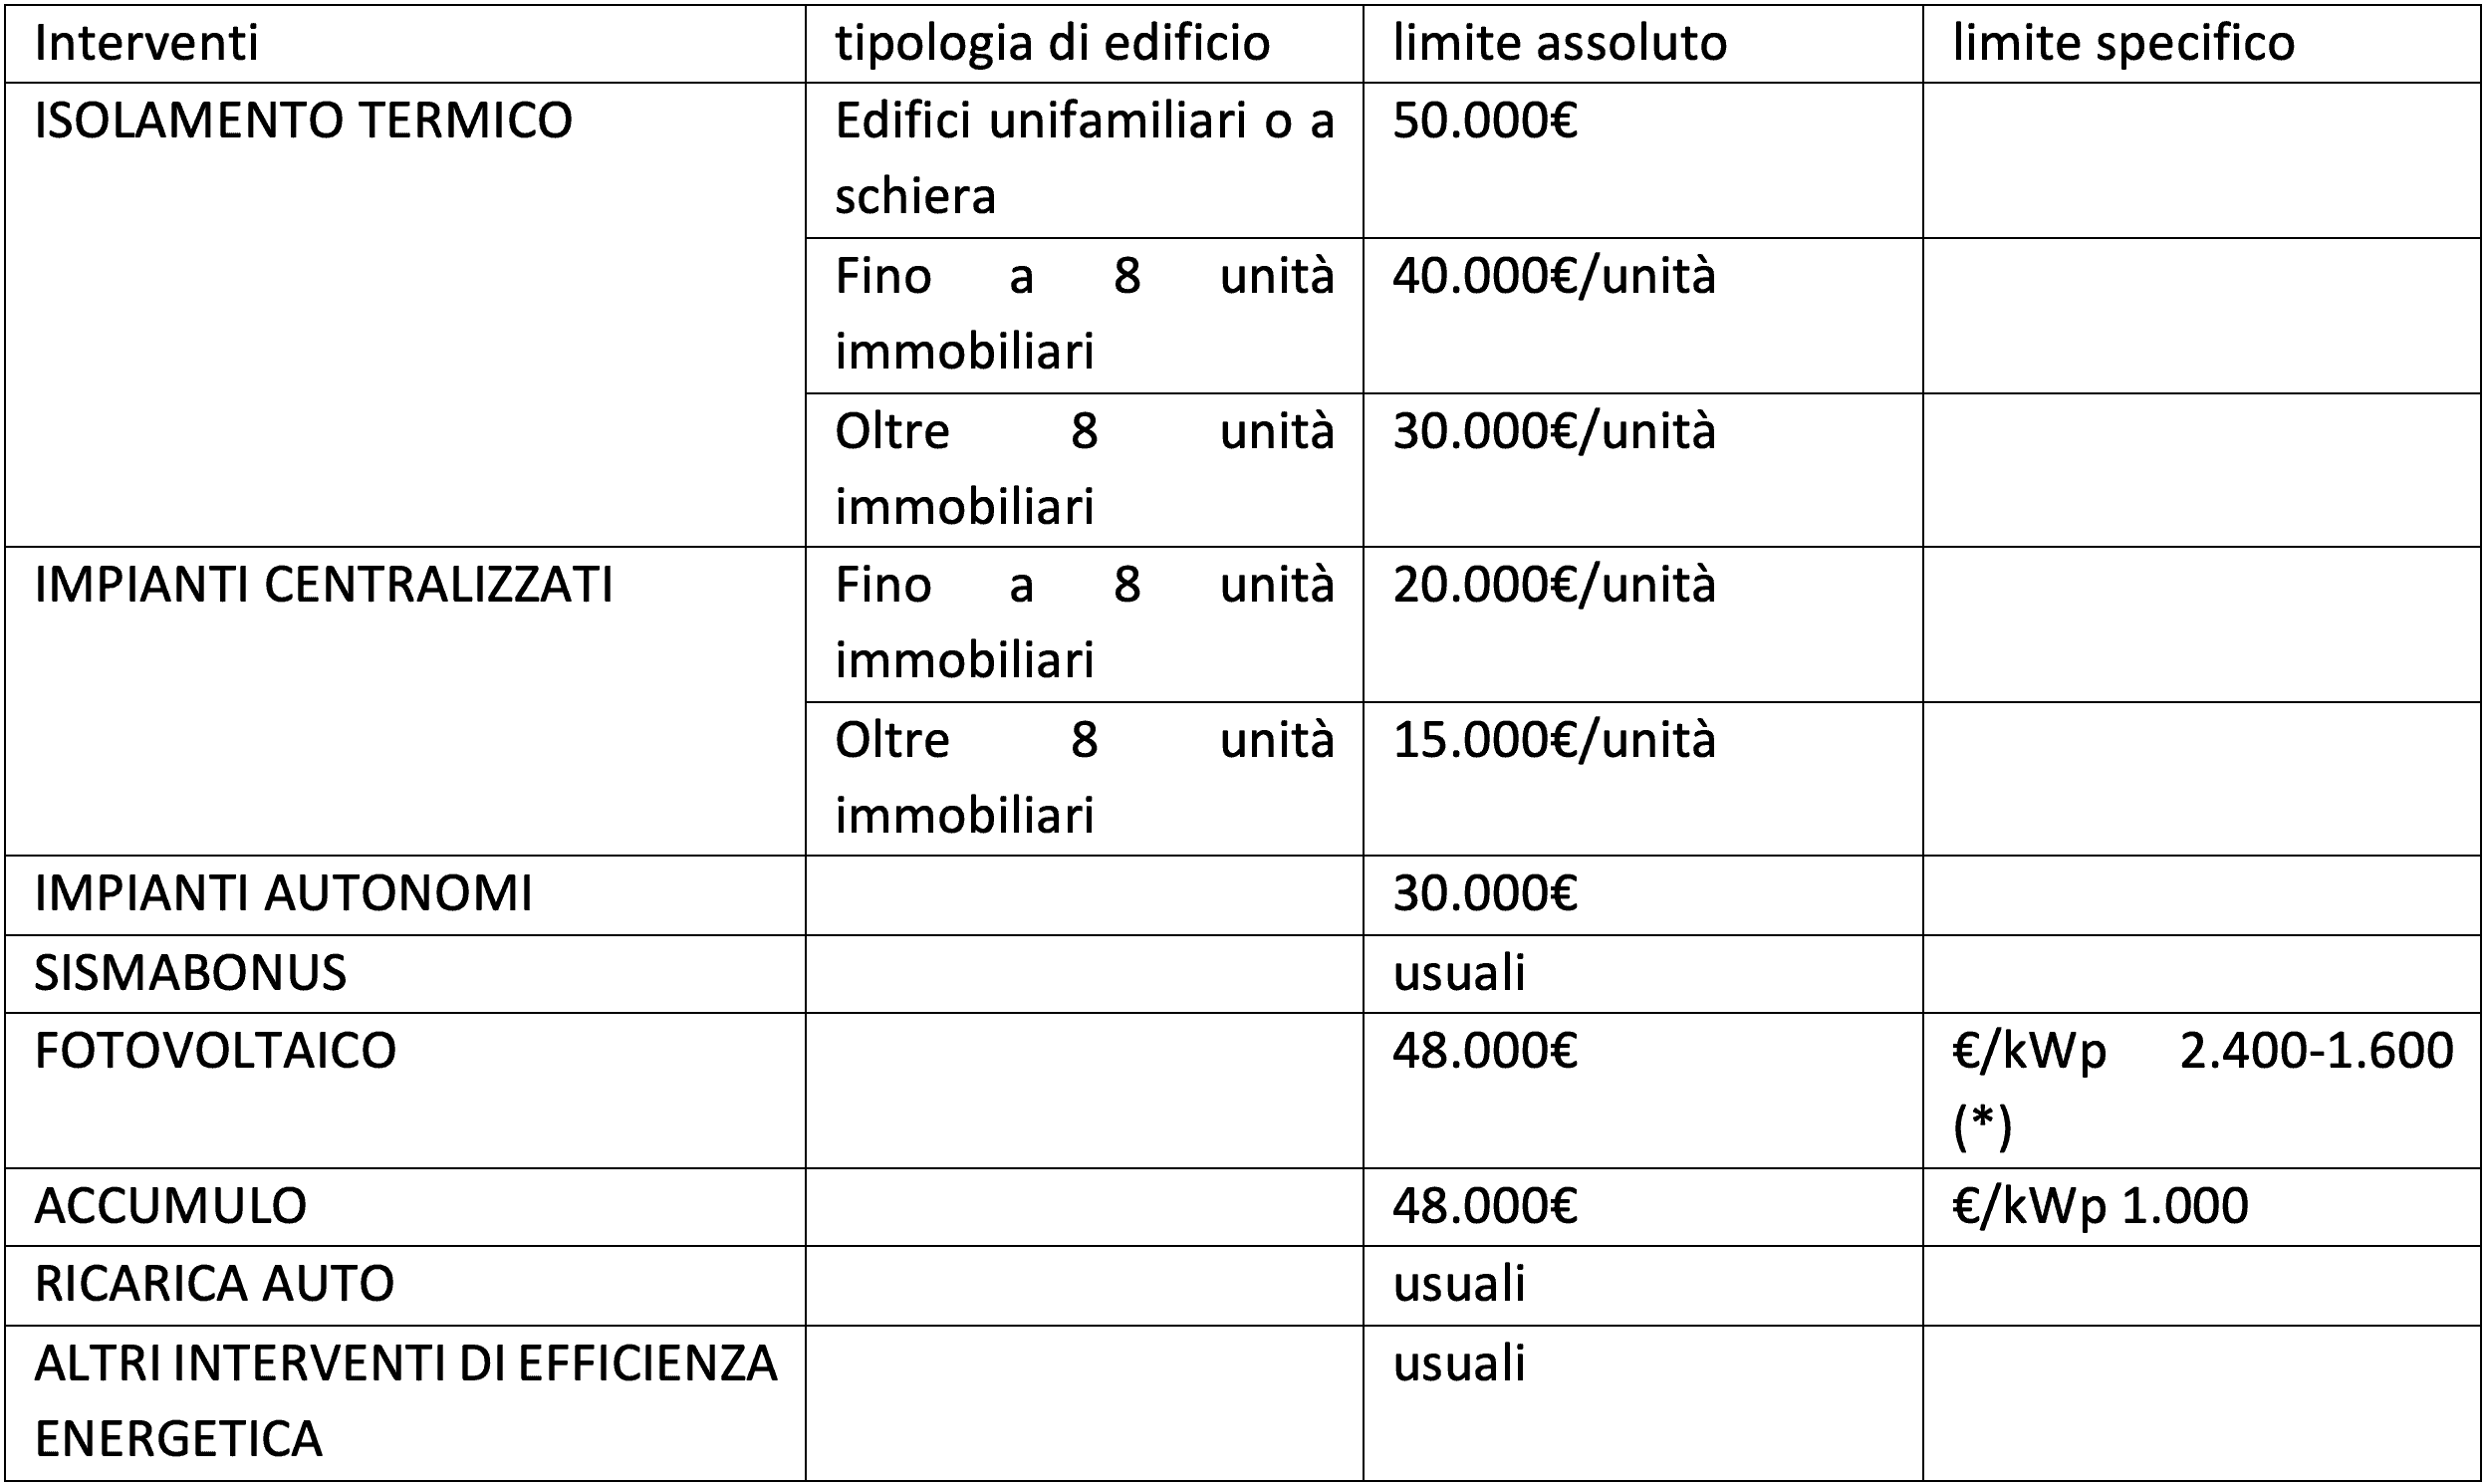 ammontare complessivo delle SPESE AMMISSIBILI al superbonus